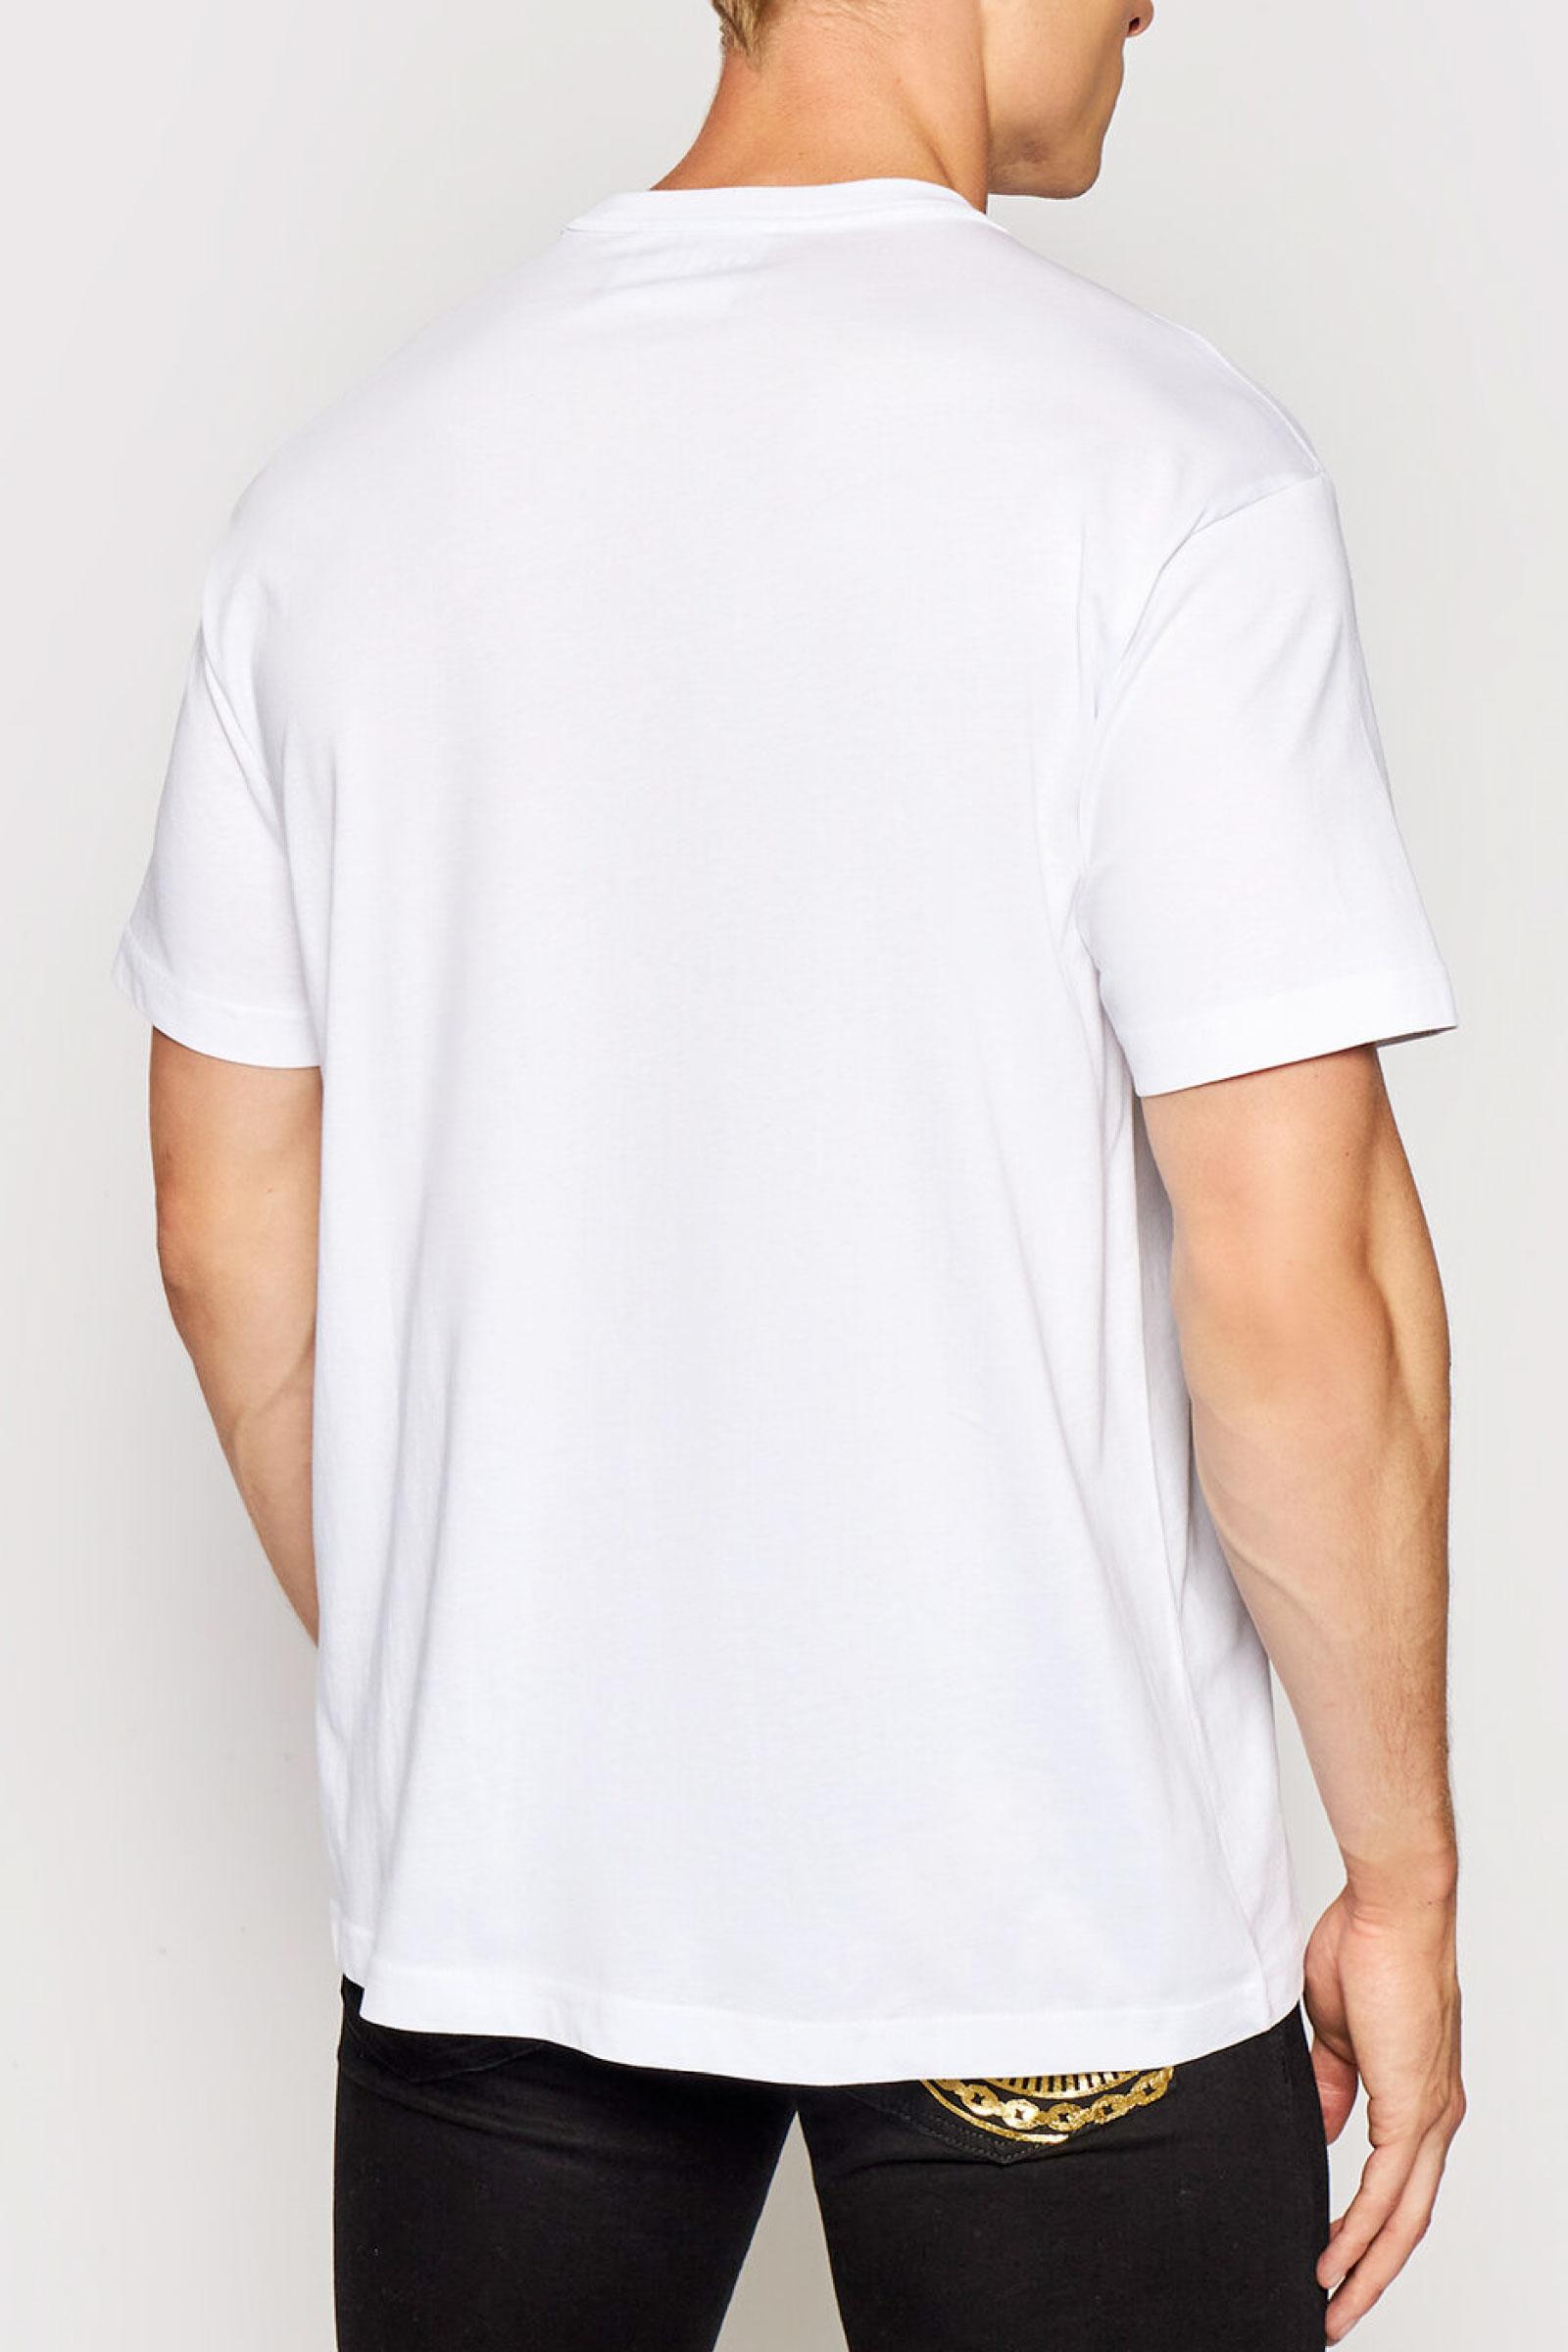 T-Shirt Uomo VERSACE JEANS COUTURE   T-Shirt   71GAHT19 CJ00T003